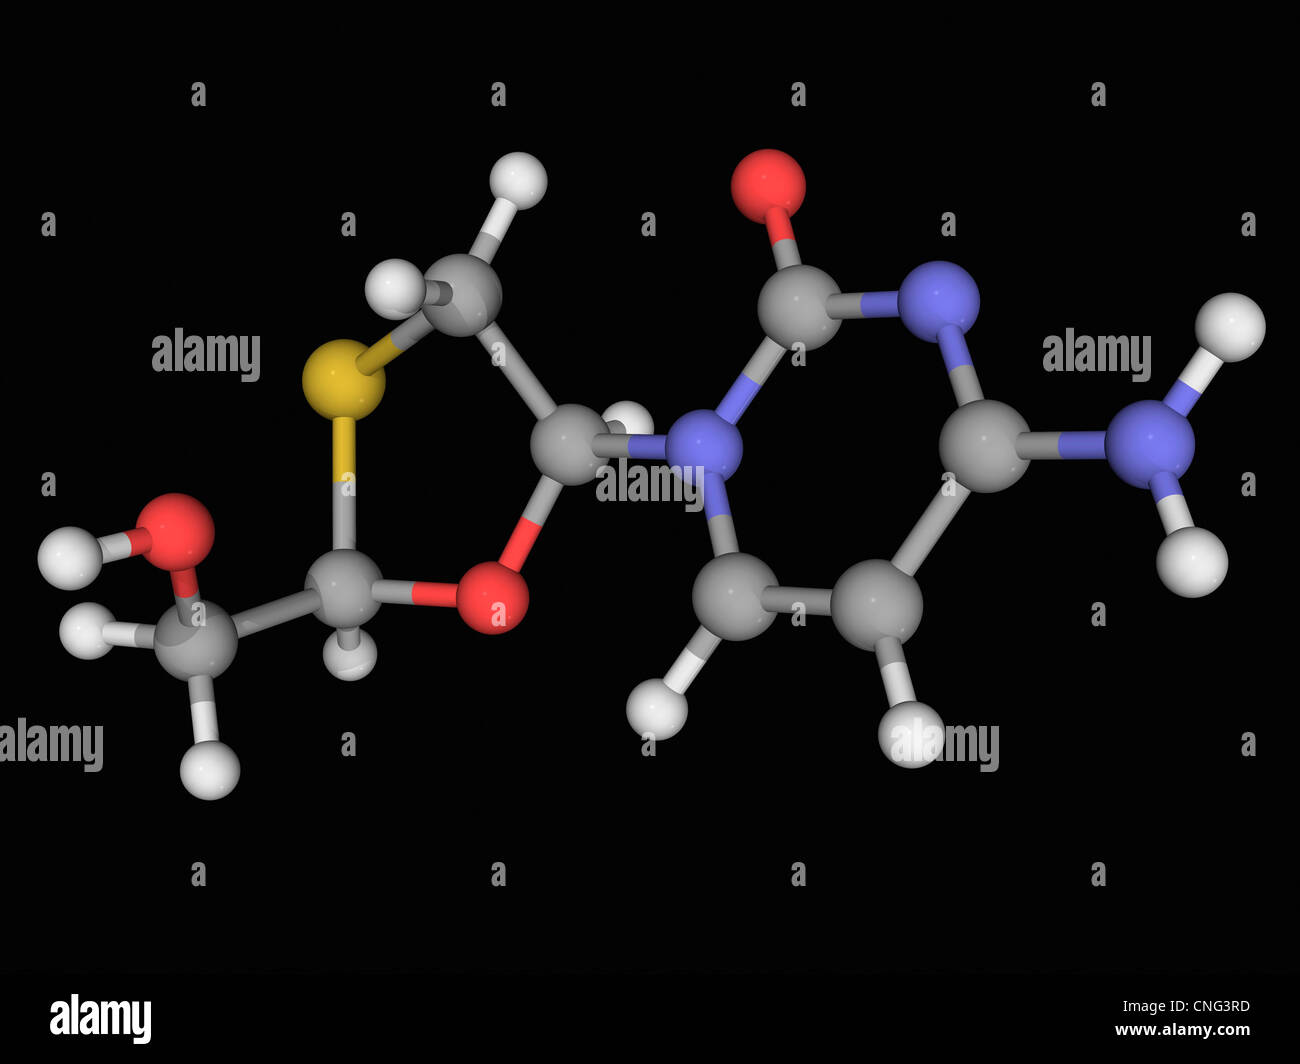 Lamivudine drug molecule - Stock Image